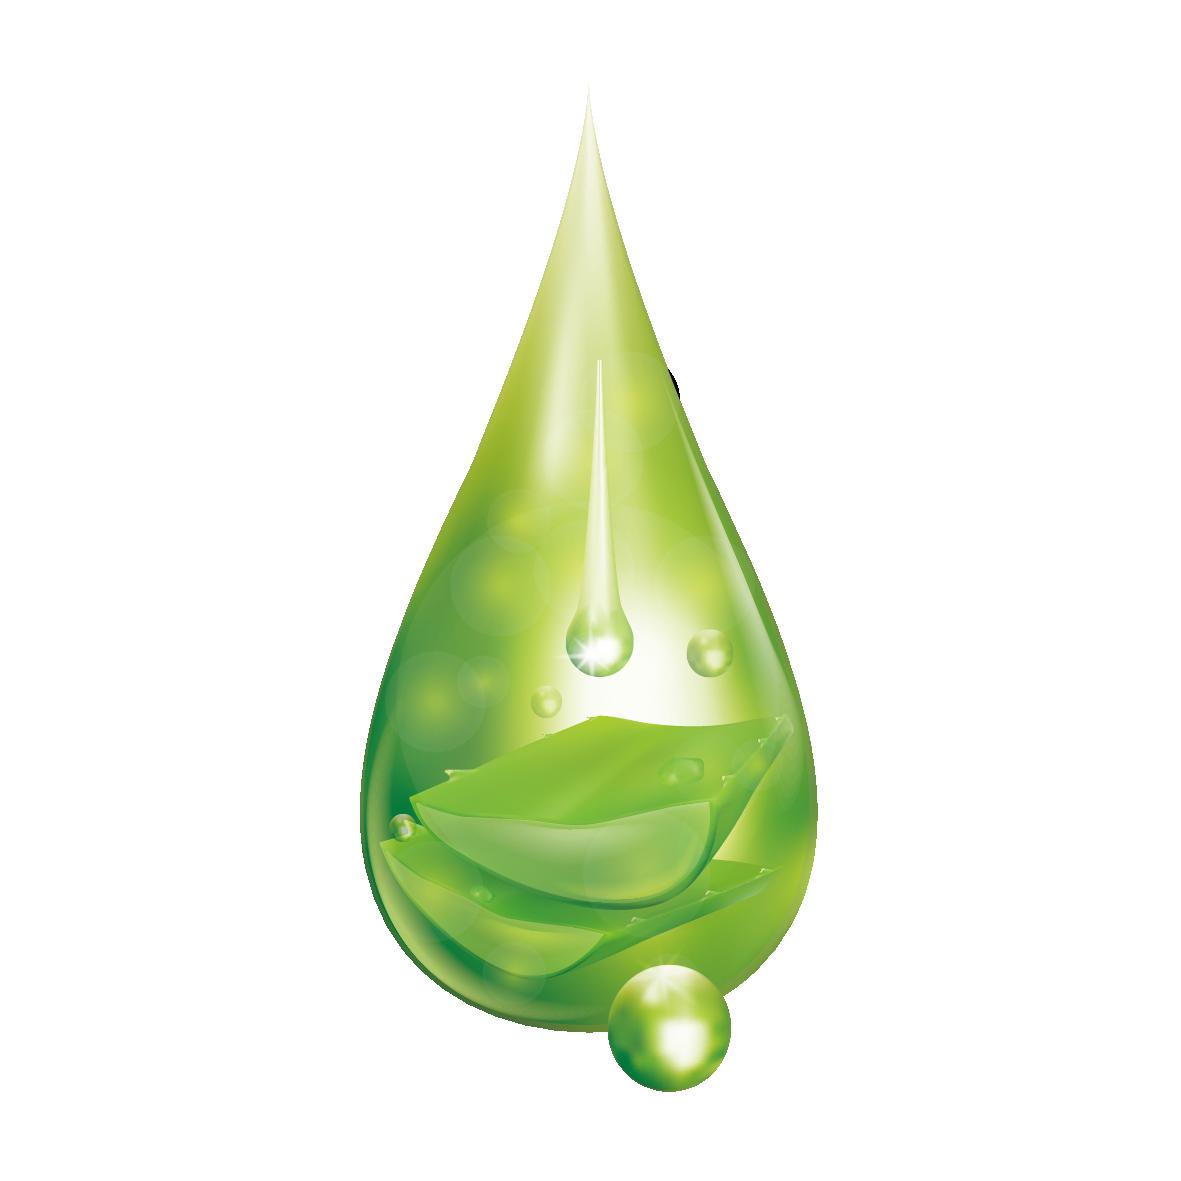 Aloevera Drop PNG Image